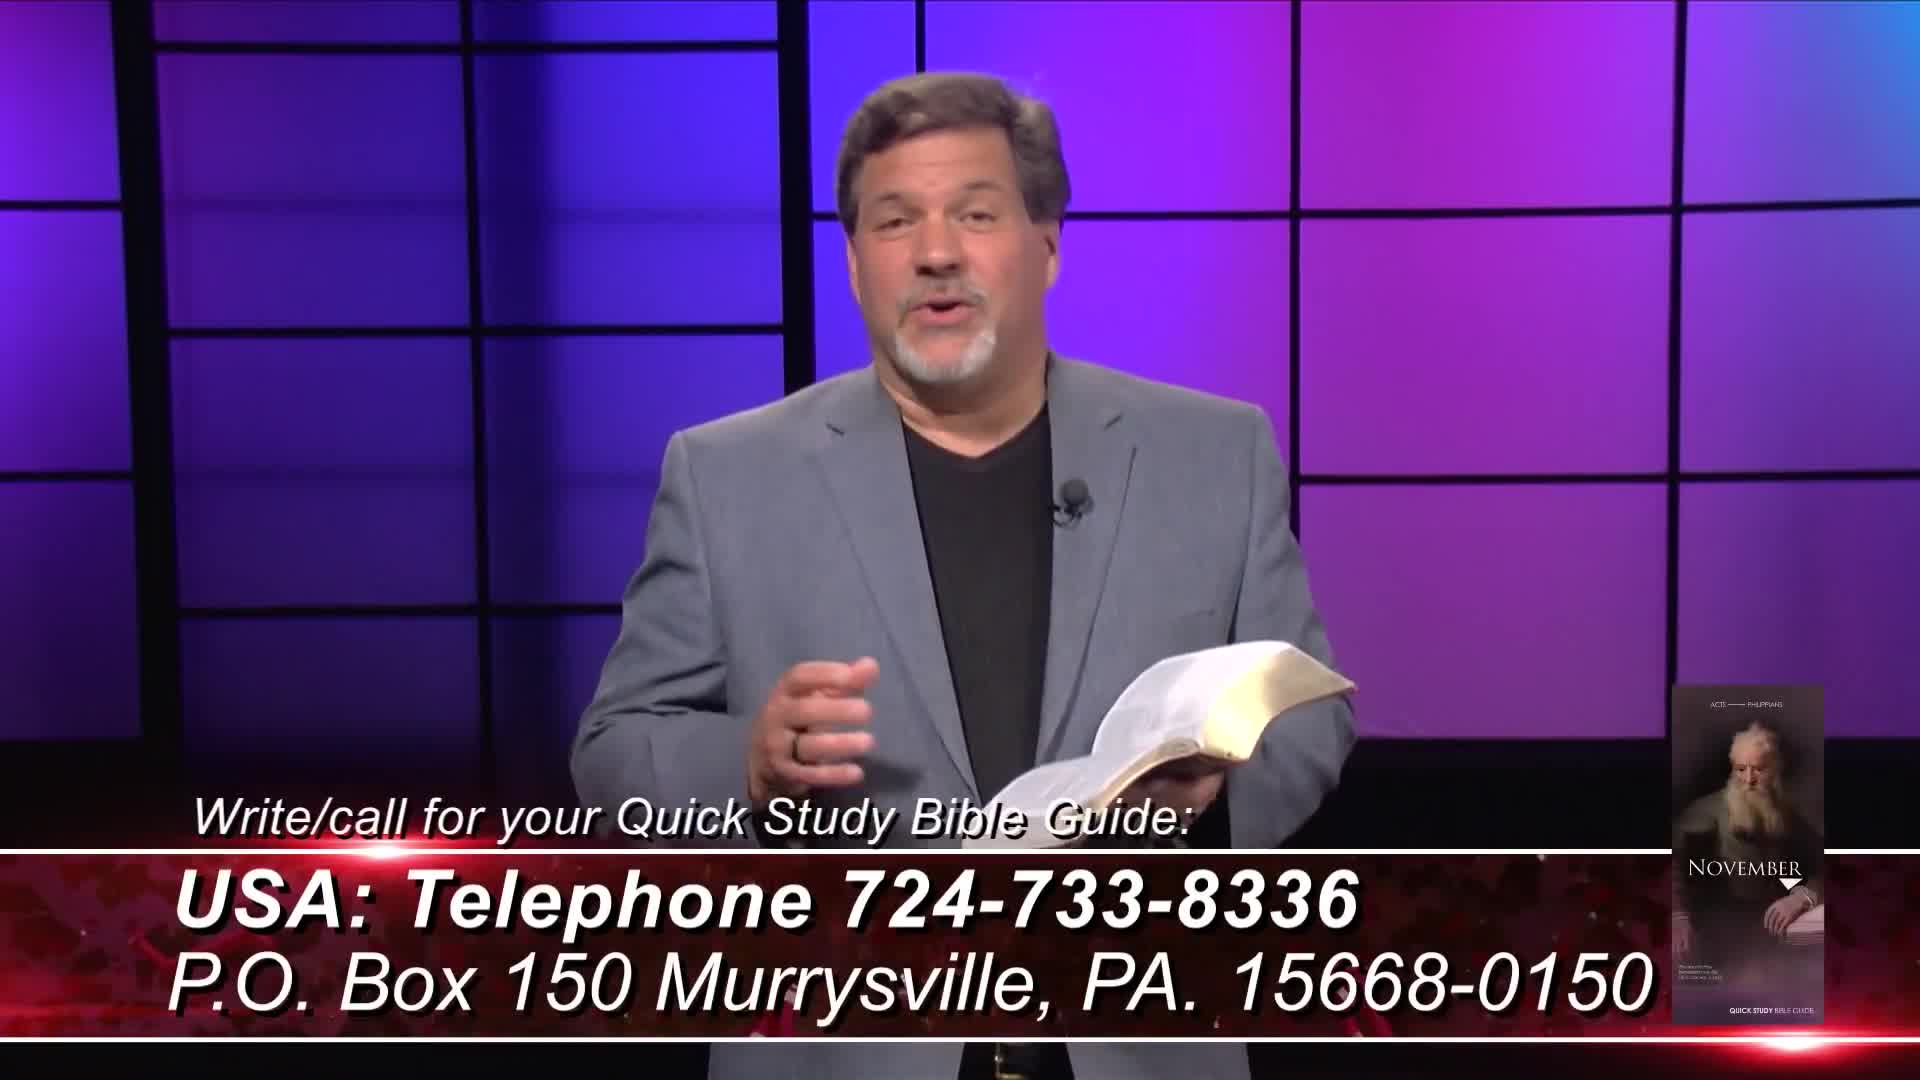 Bible Discovery - 2 Corinthians 10-13 Church Leadership